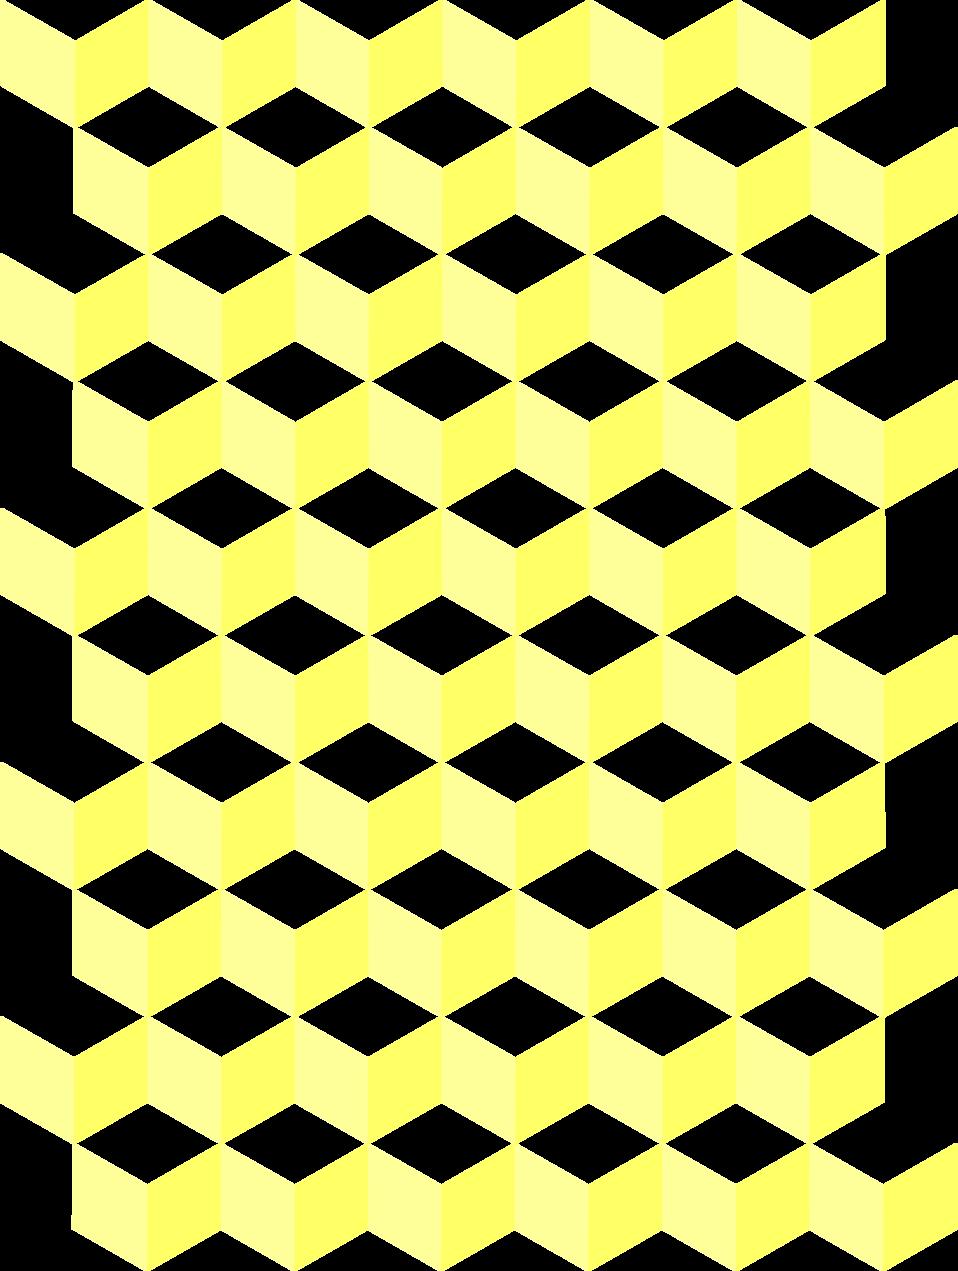 Free stock photo illustration. Honeycomb clipart honeycomb design